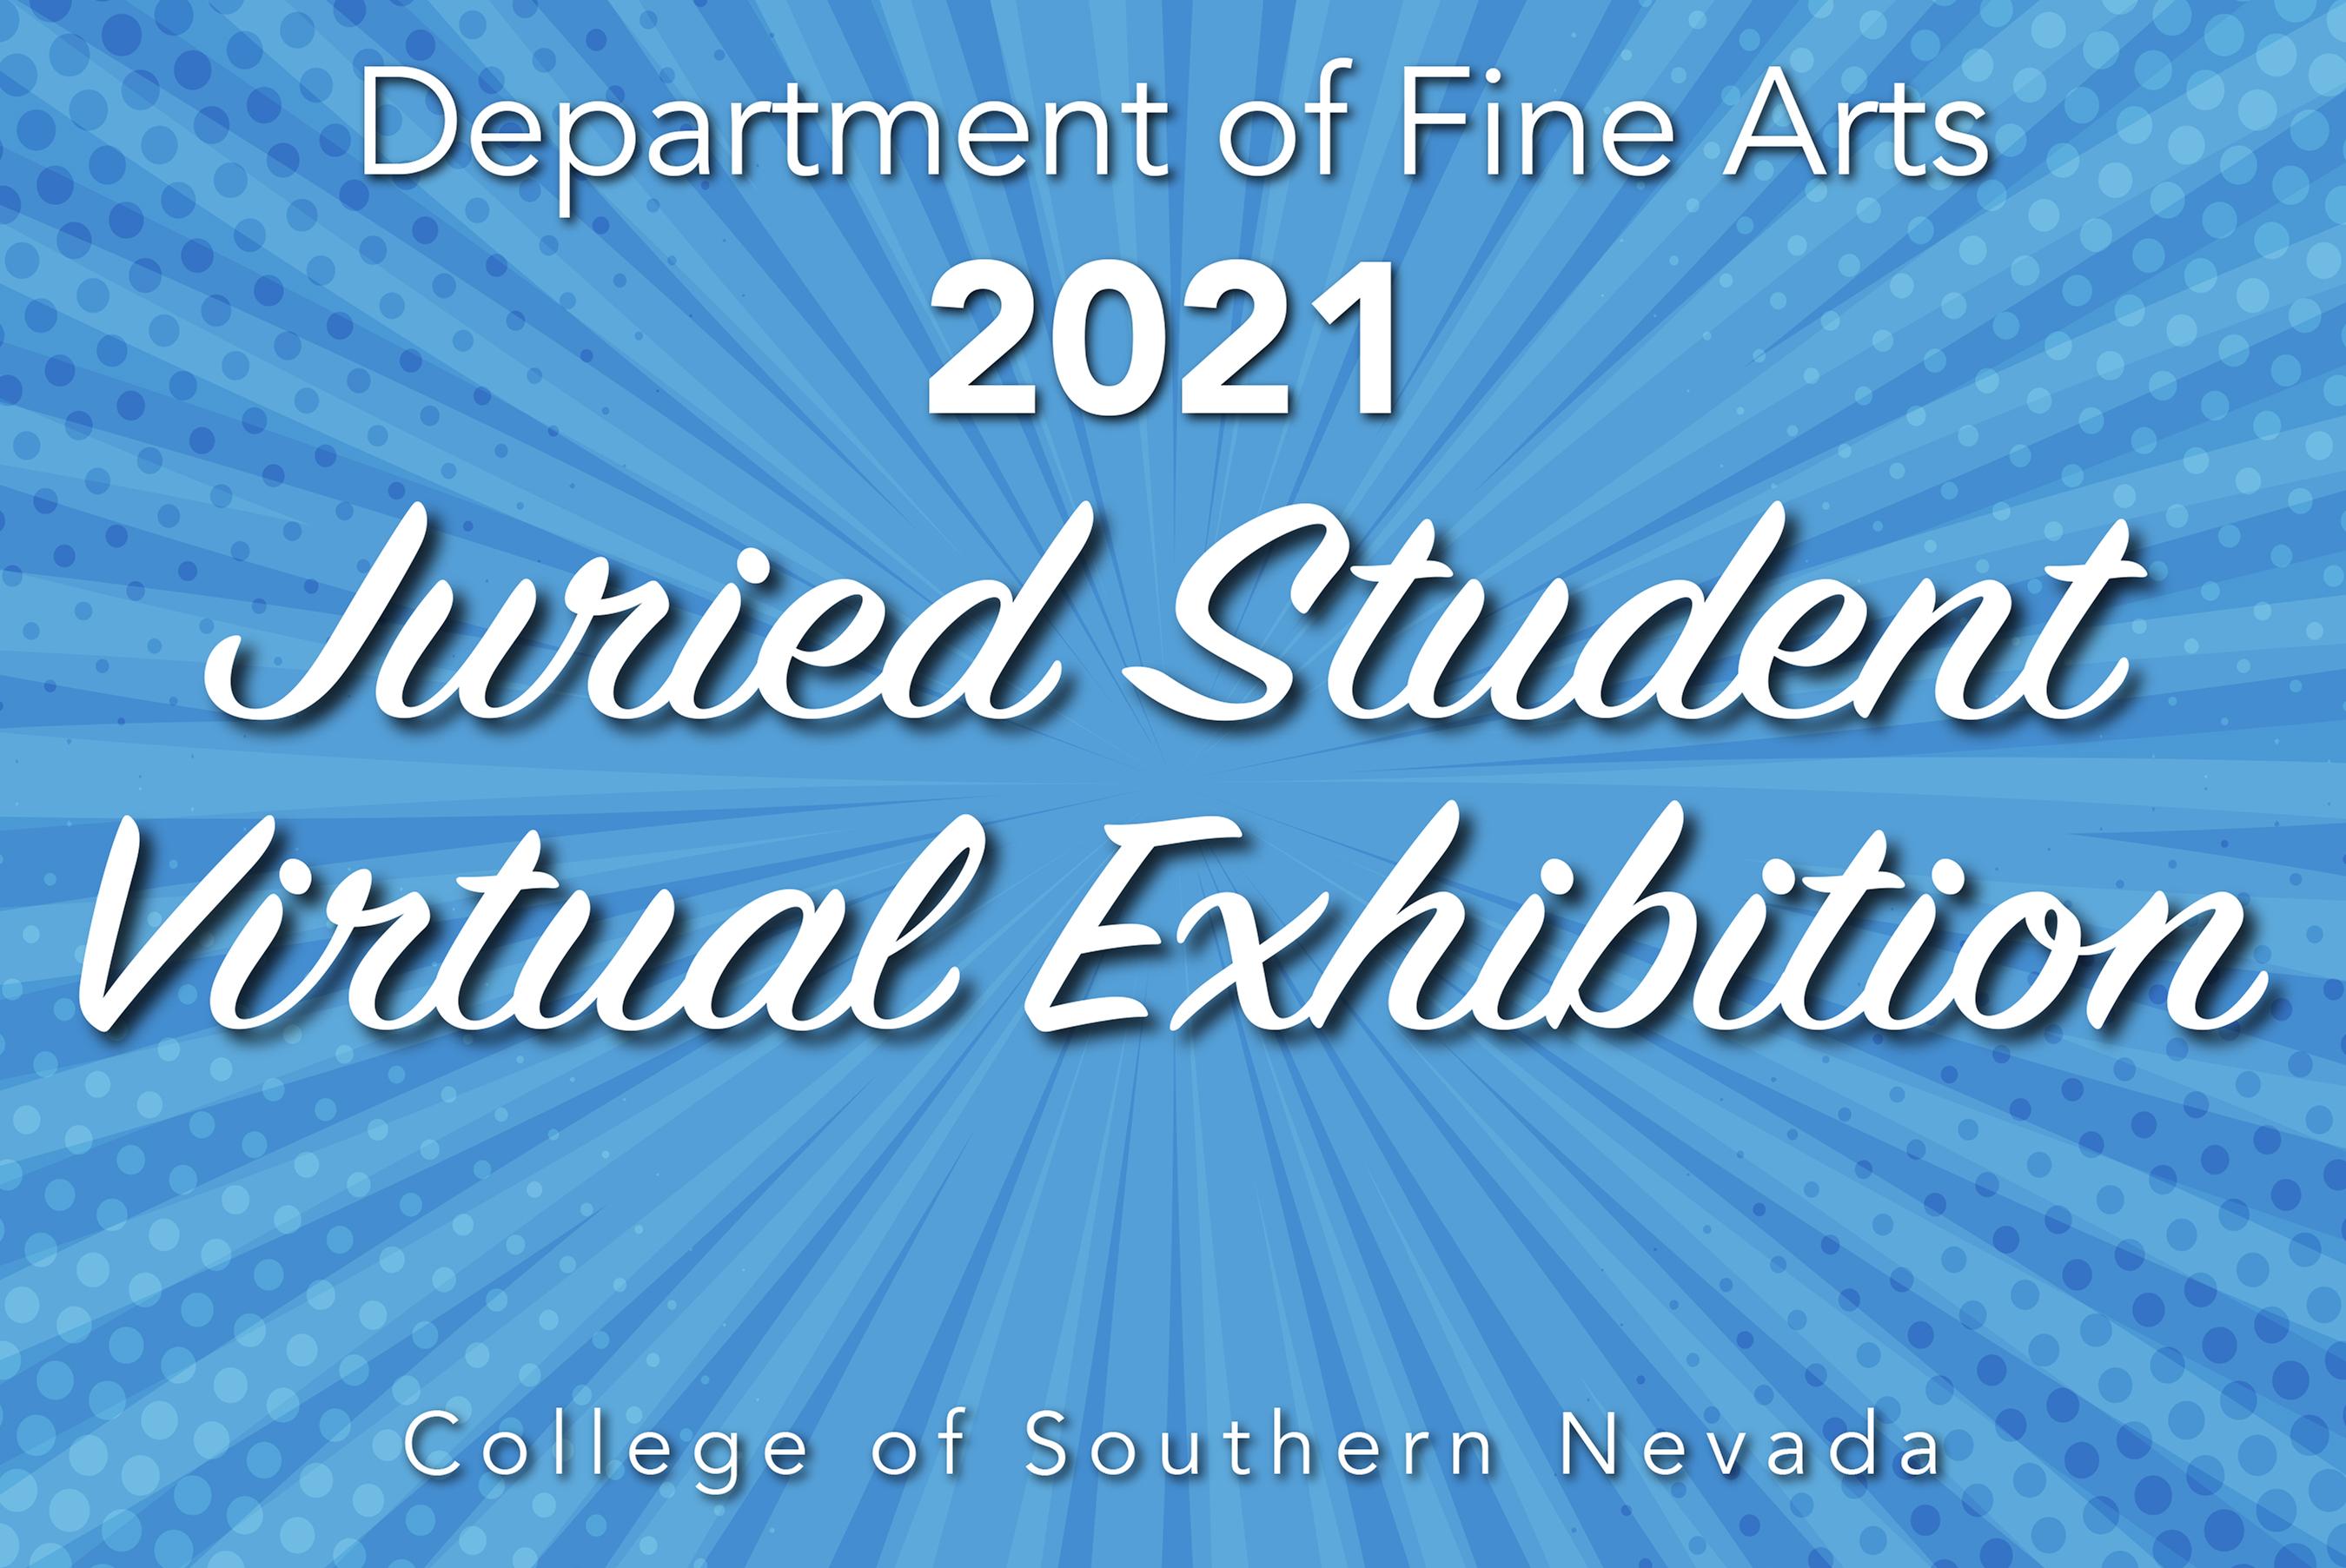 Alumni gallery background image